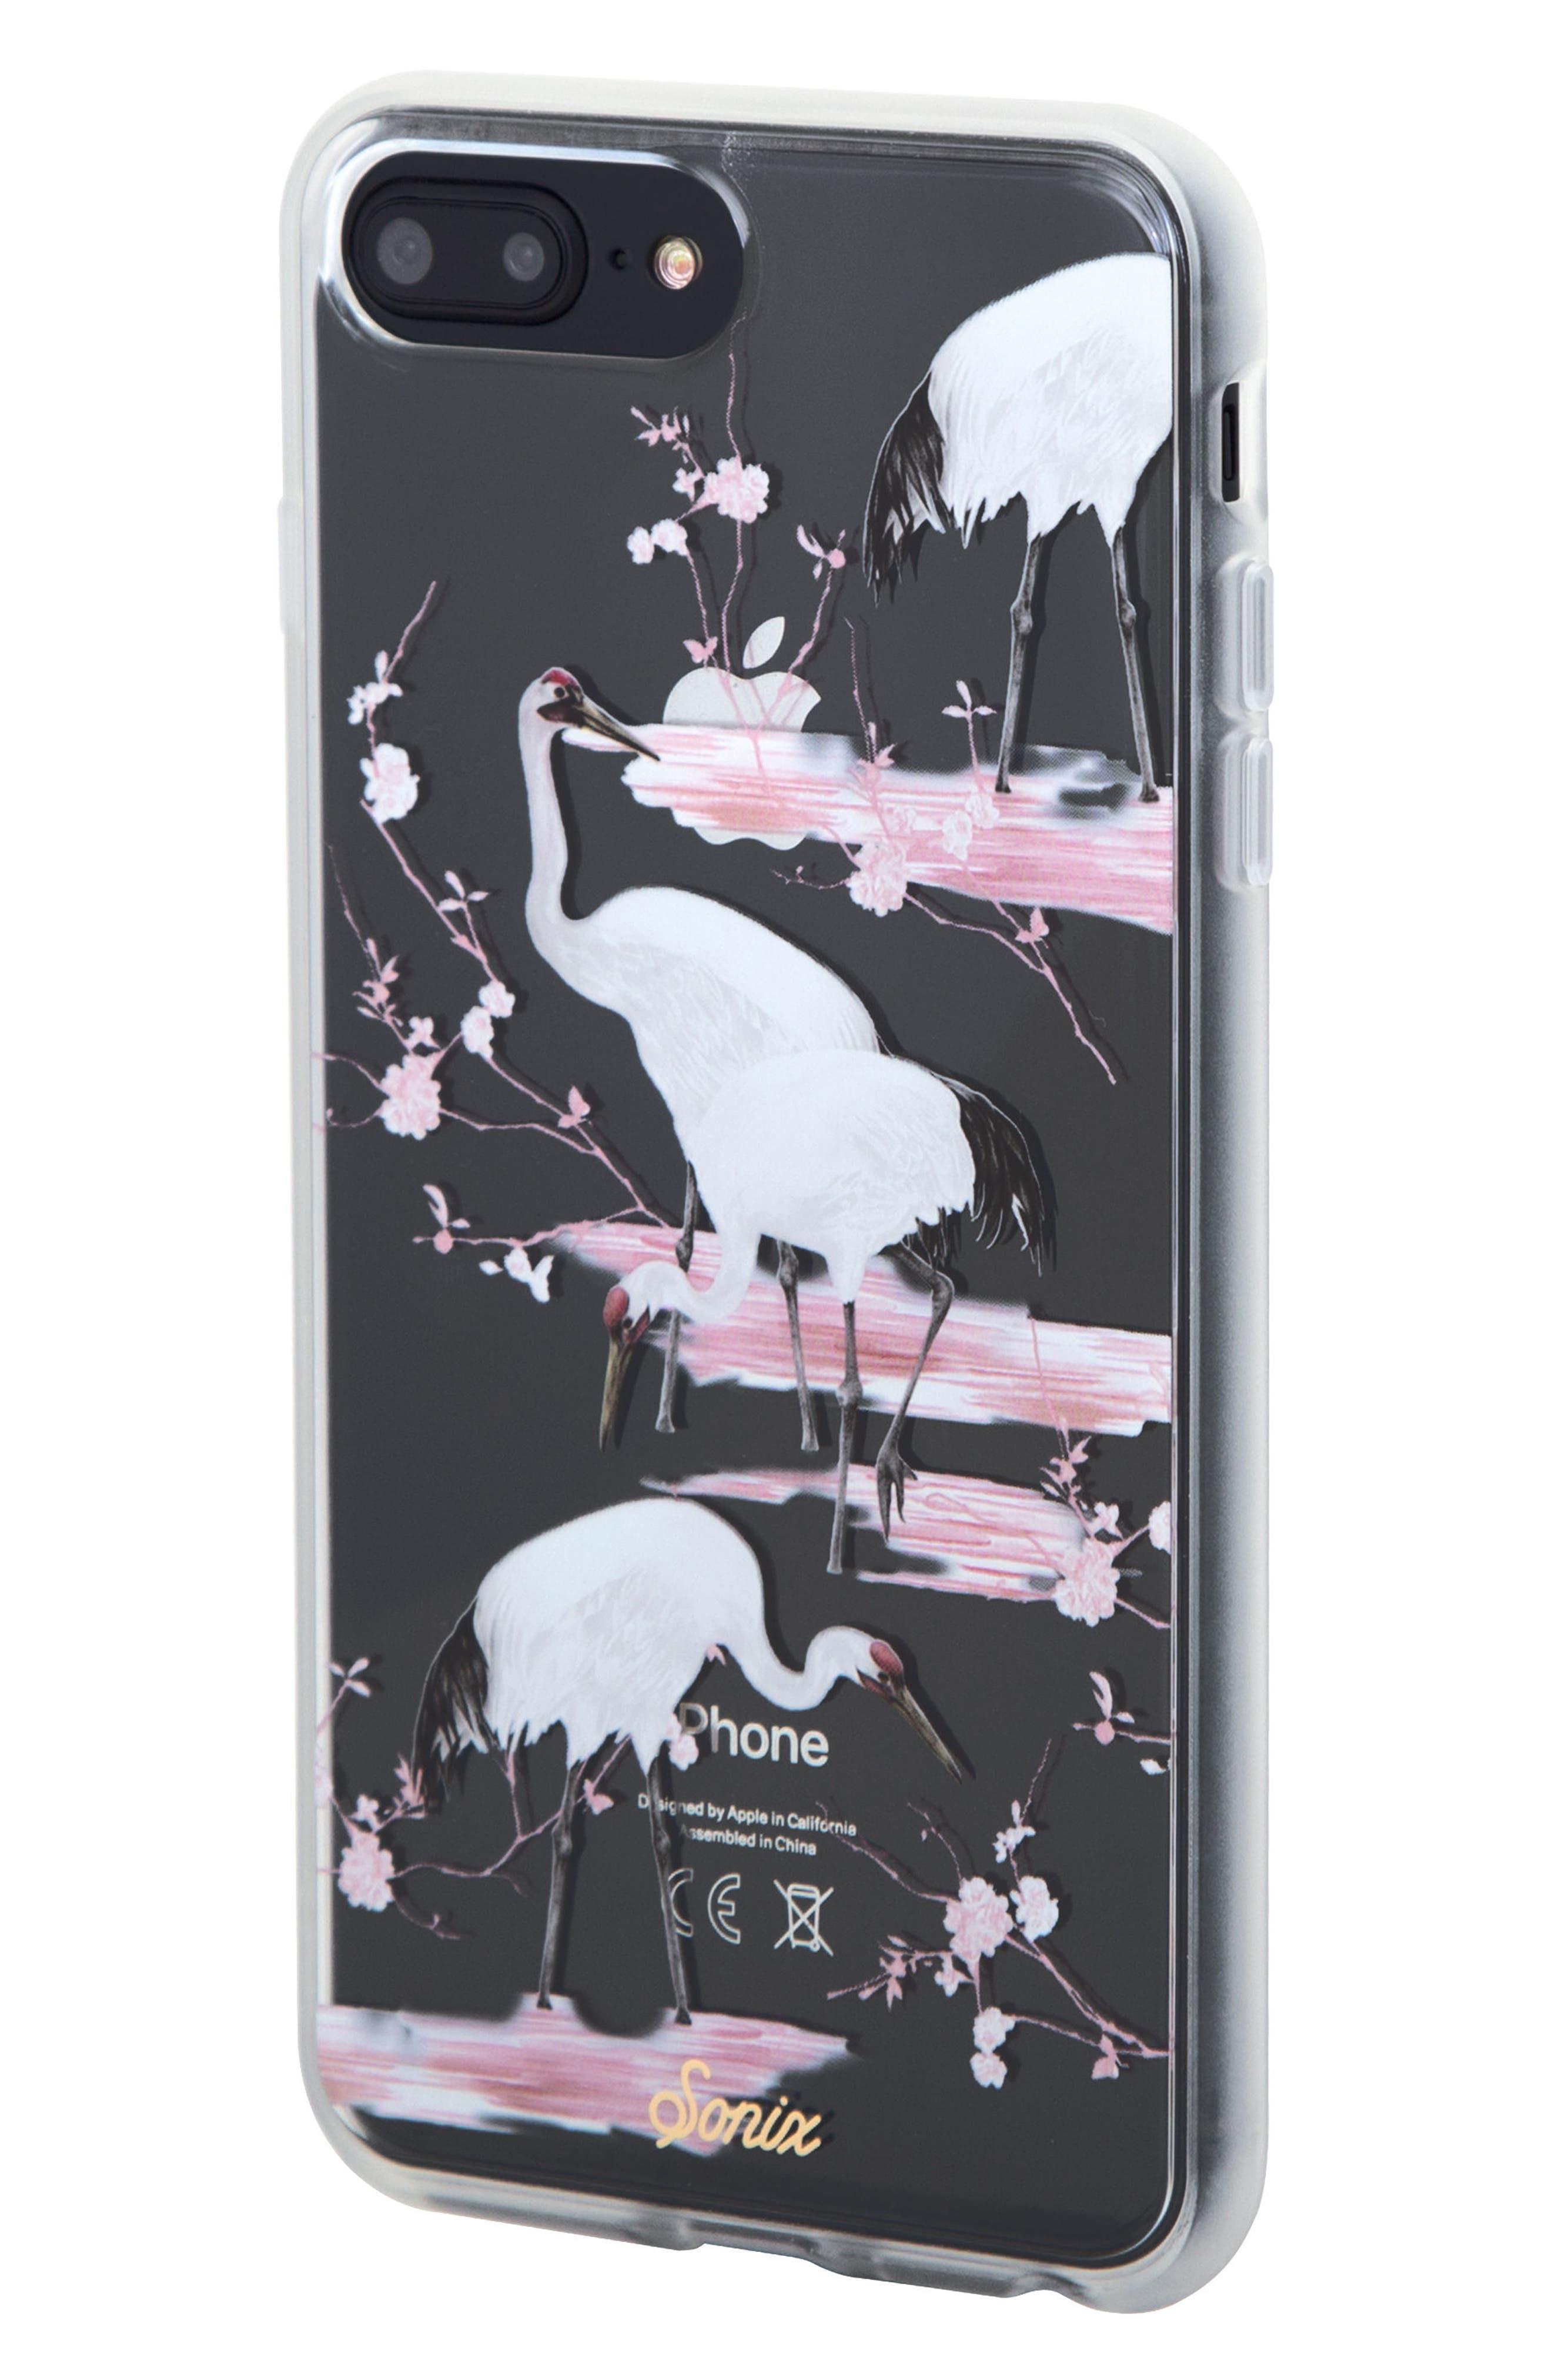 Crane iPhone 6/6s/7/8 Plus Case,                             Alternate thumbnail 2, color,                             WHITE/ PINK